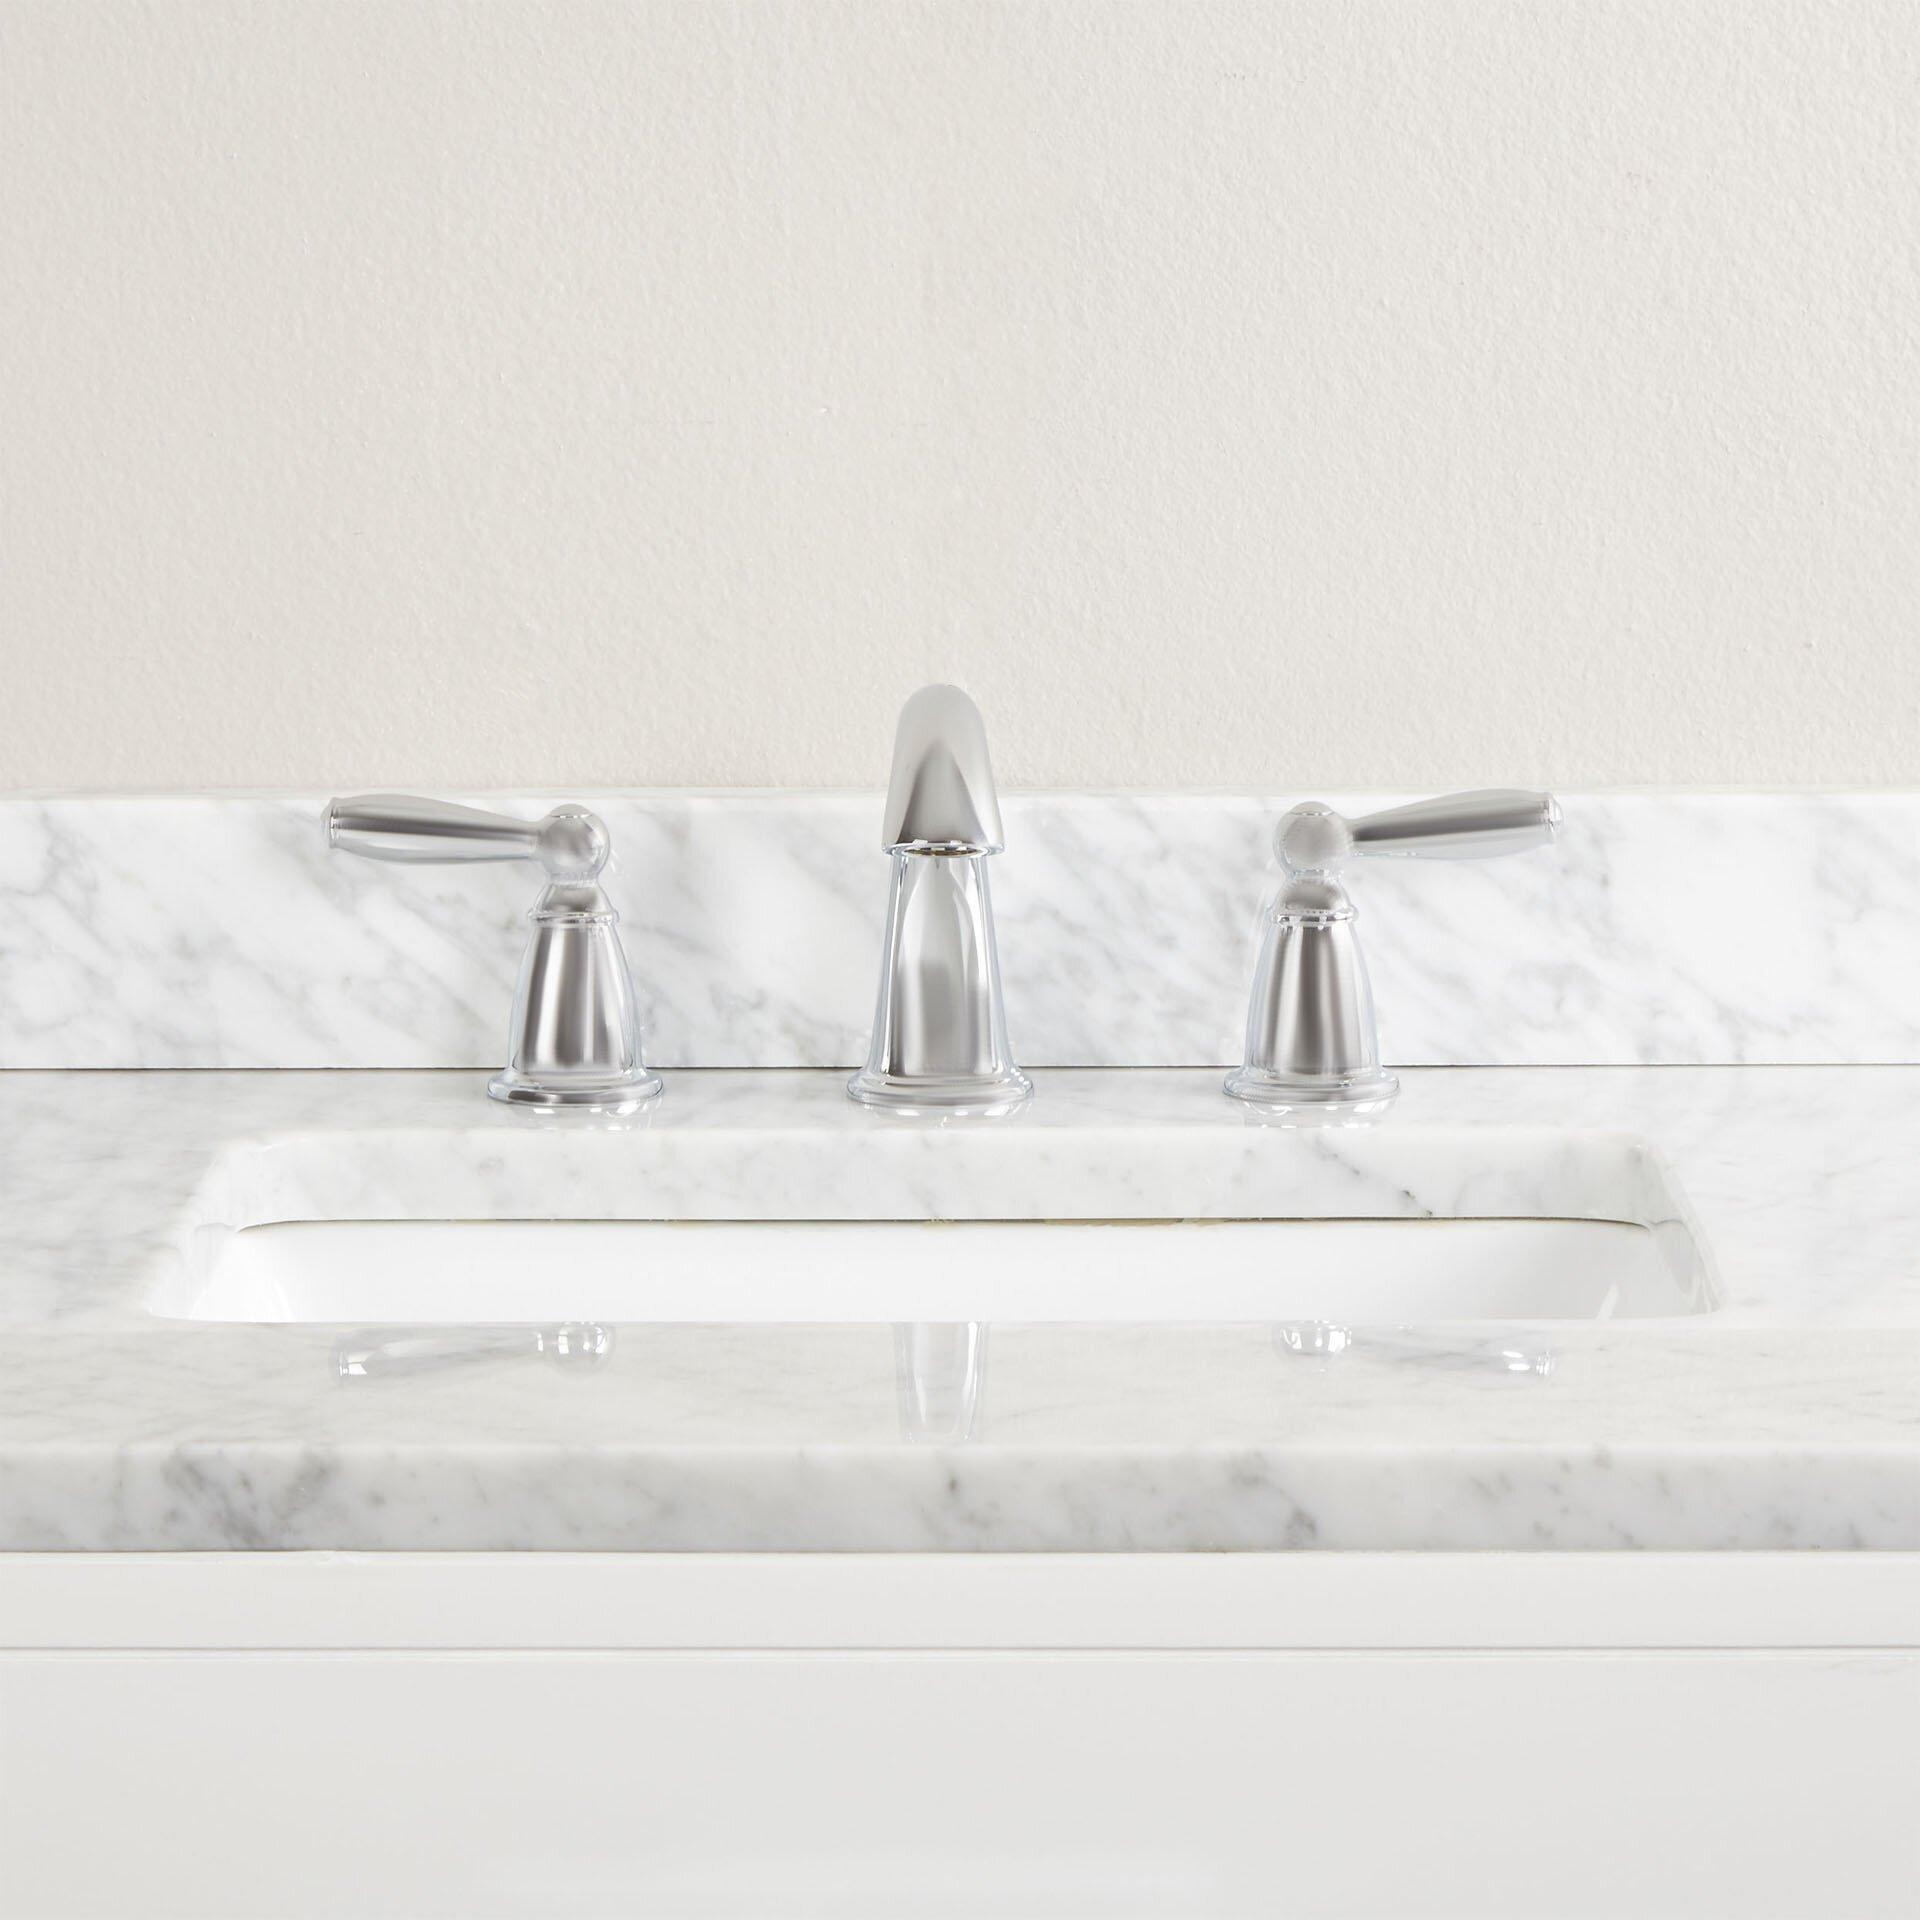 moen bathroom faucets repair instructions | My Web Value